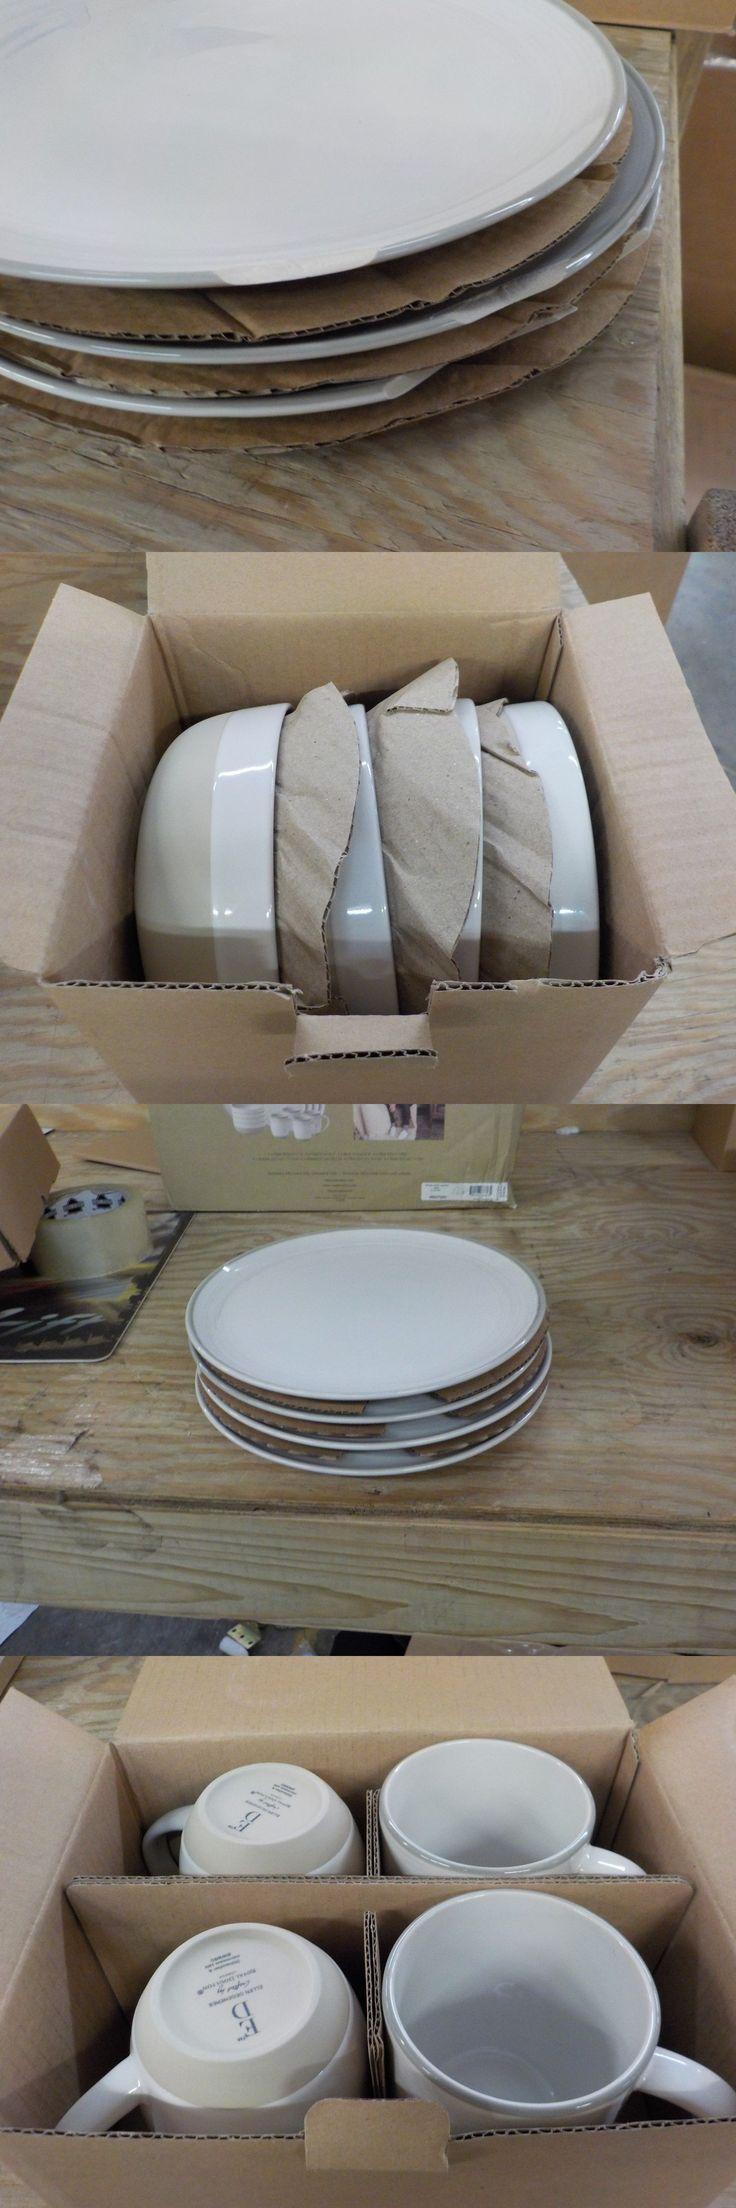 Dinner Service Sets 36032: Ed Ellen Degeneres Brushed Glaze 16-Piece Stoneware Dinnerware In White. *Read* -> BUY IT NOW ONLY: $74.99 on eBay!